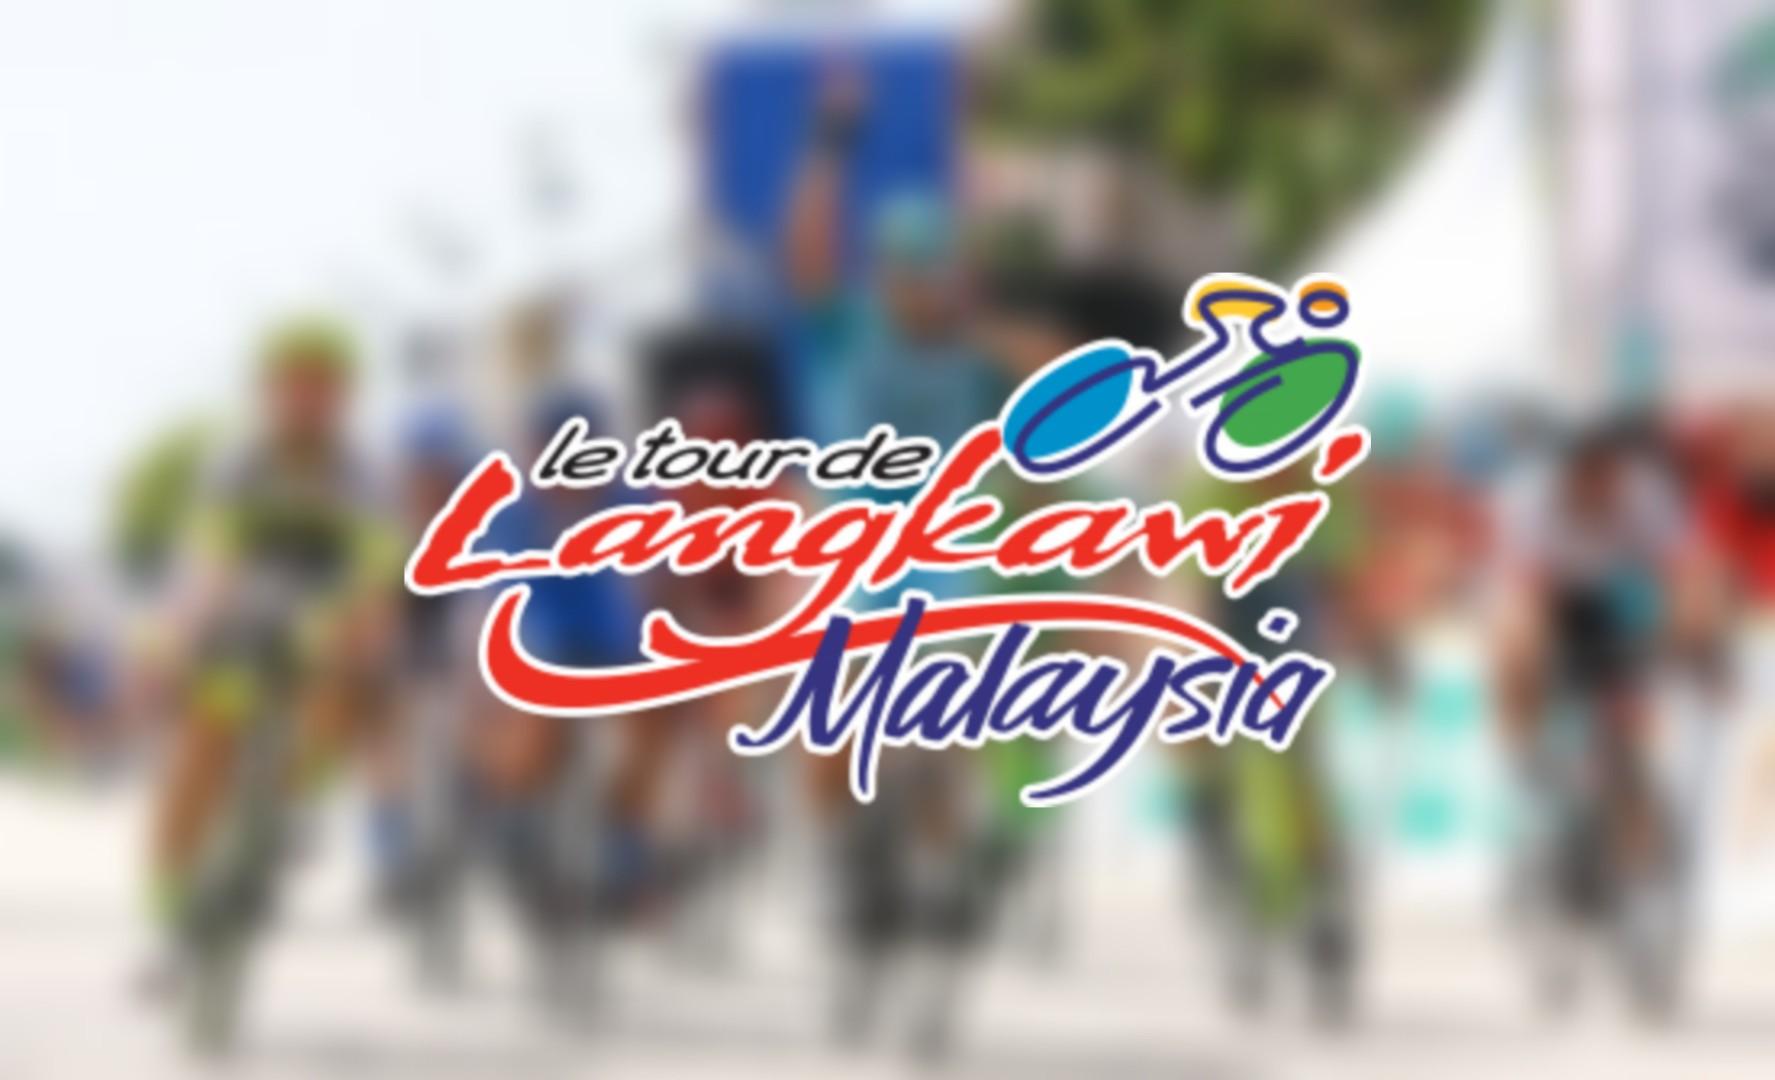 Jadual Perlumbaan Le Tour de Langkawi 2019 LTDL